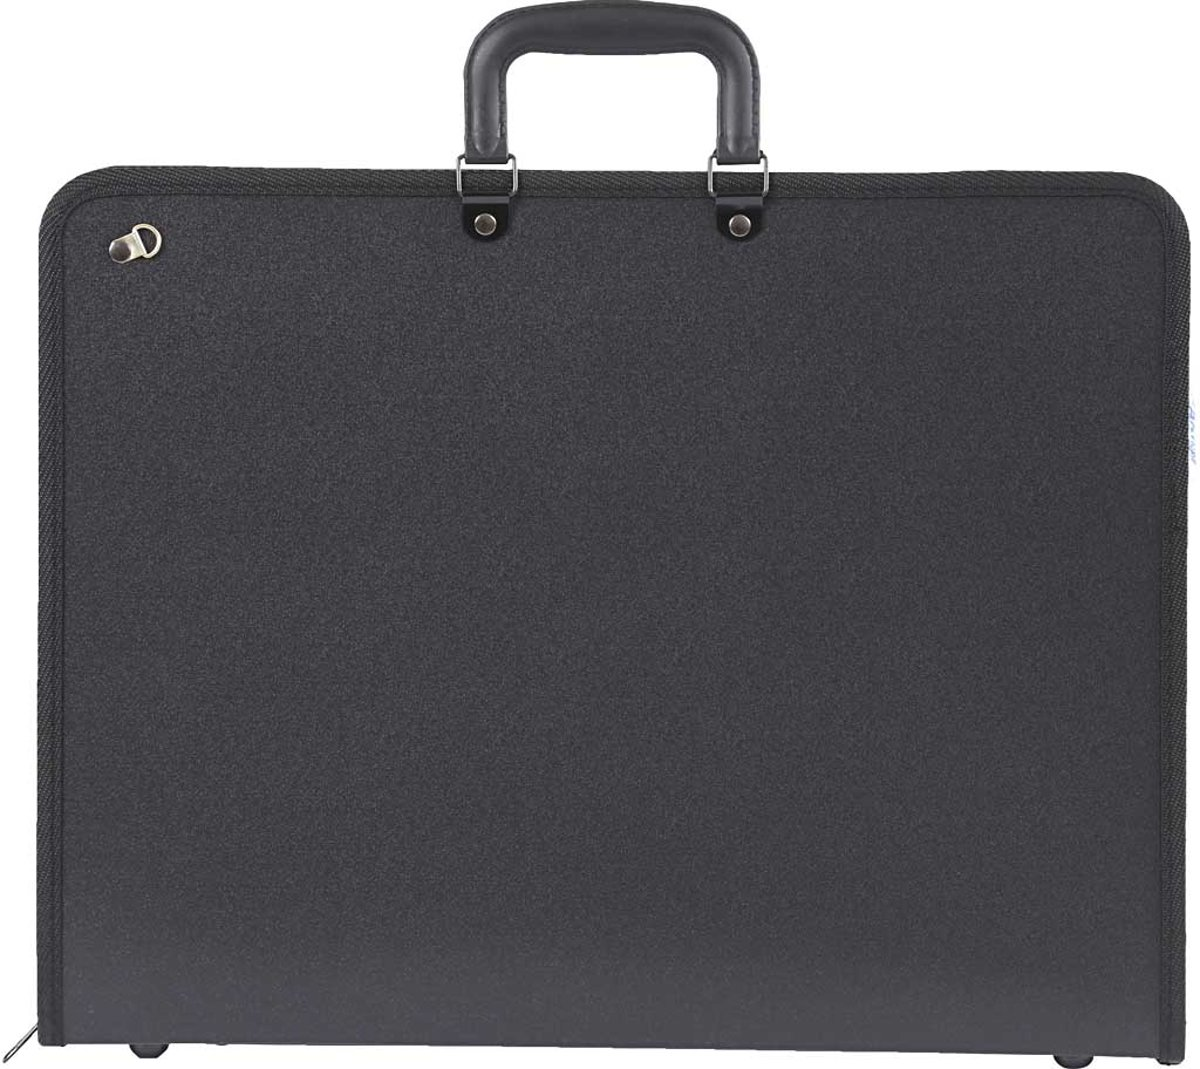 Portfolio - A3MP, zwart, 1 stuk kopen